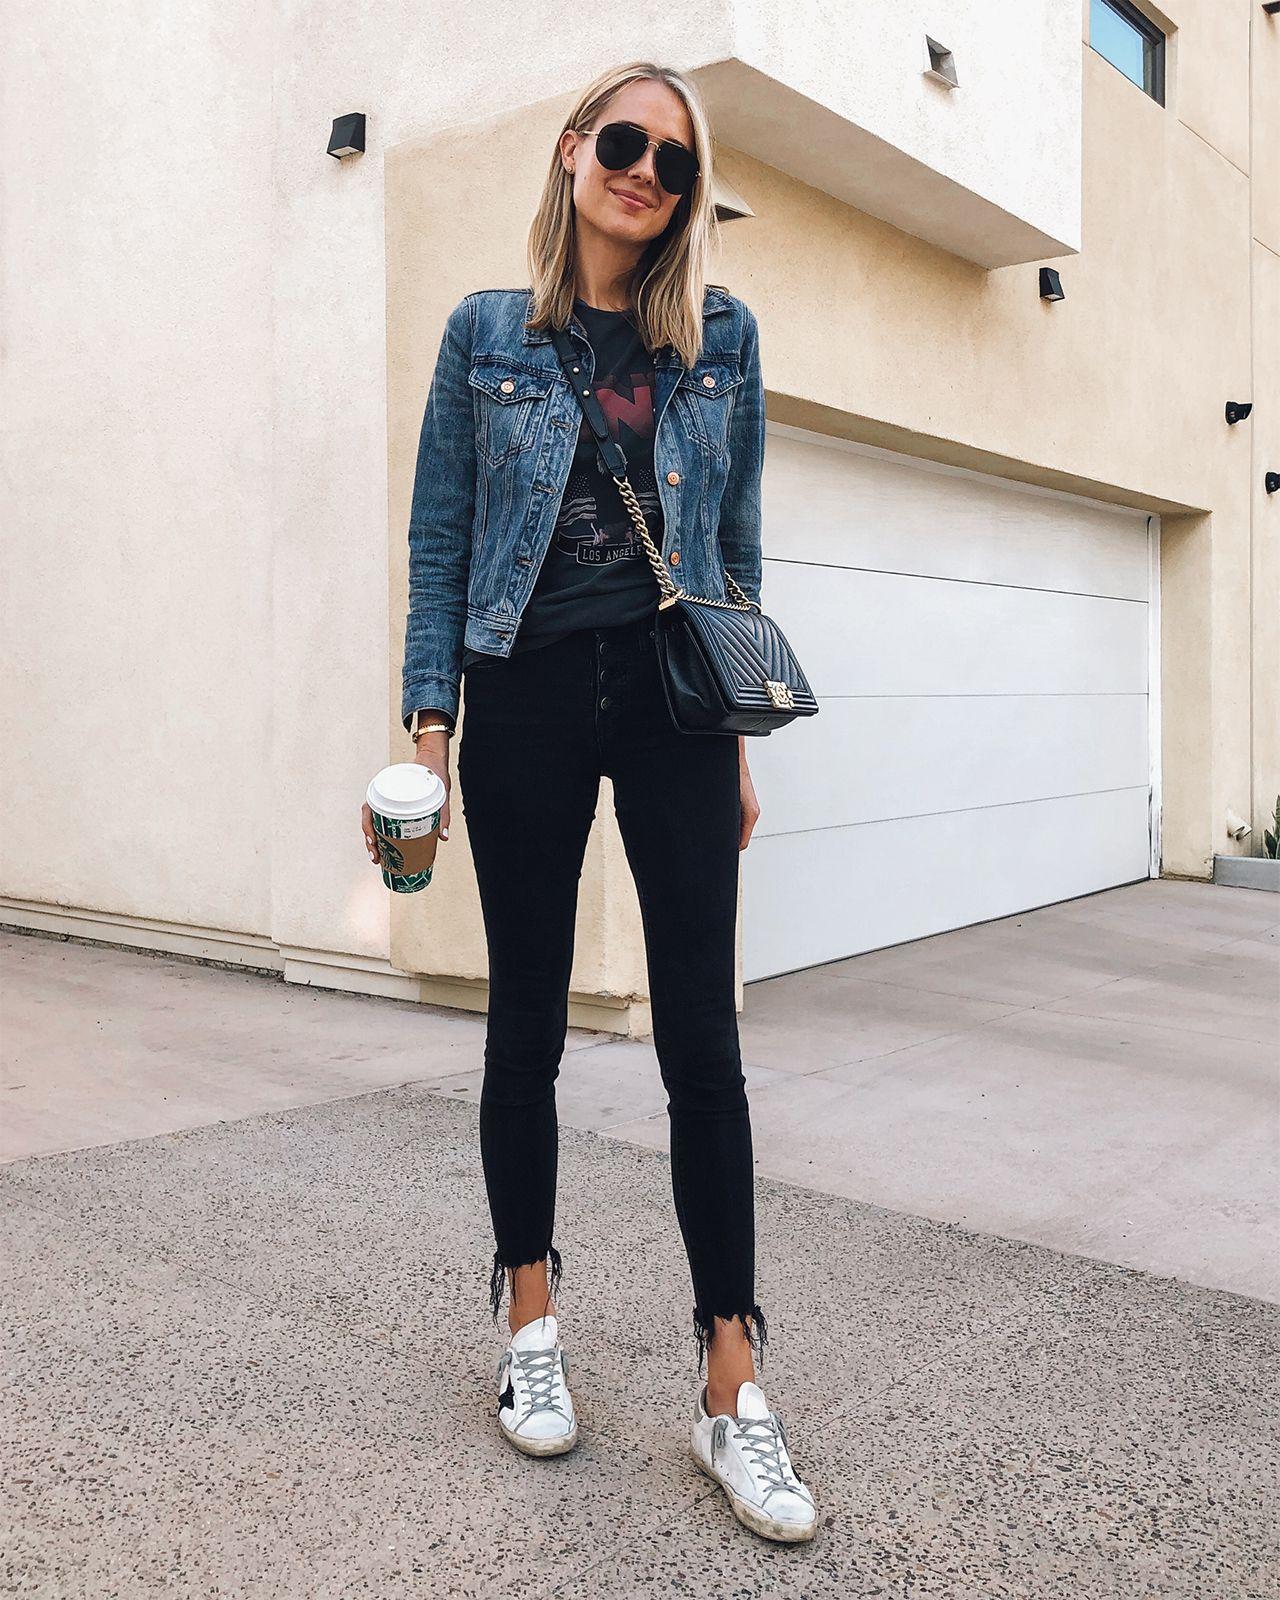 00228cad209 Fashion Jackson Wearing Denim Jacket Anine Bing Vintage Tshirt Madewell  Ripped Jeans Golden Goose Sneakers Chanel Boy Bag